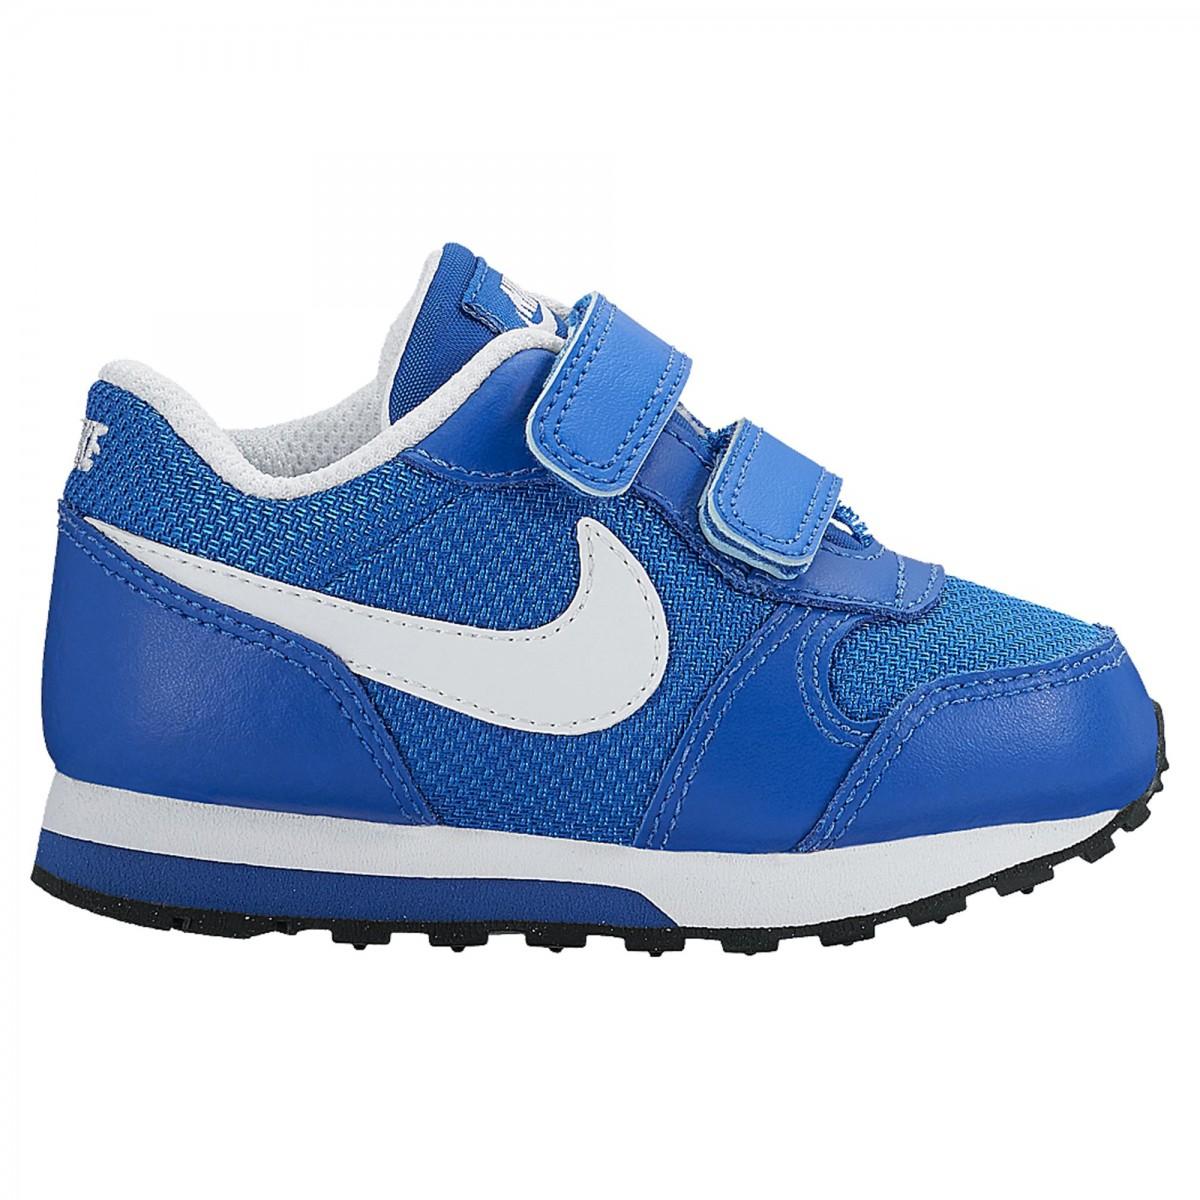 9a3dff0b22683 Bizz Store - Tênis Infantil Masculino Nike MD Runner 2 Azul